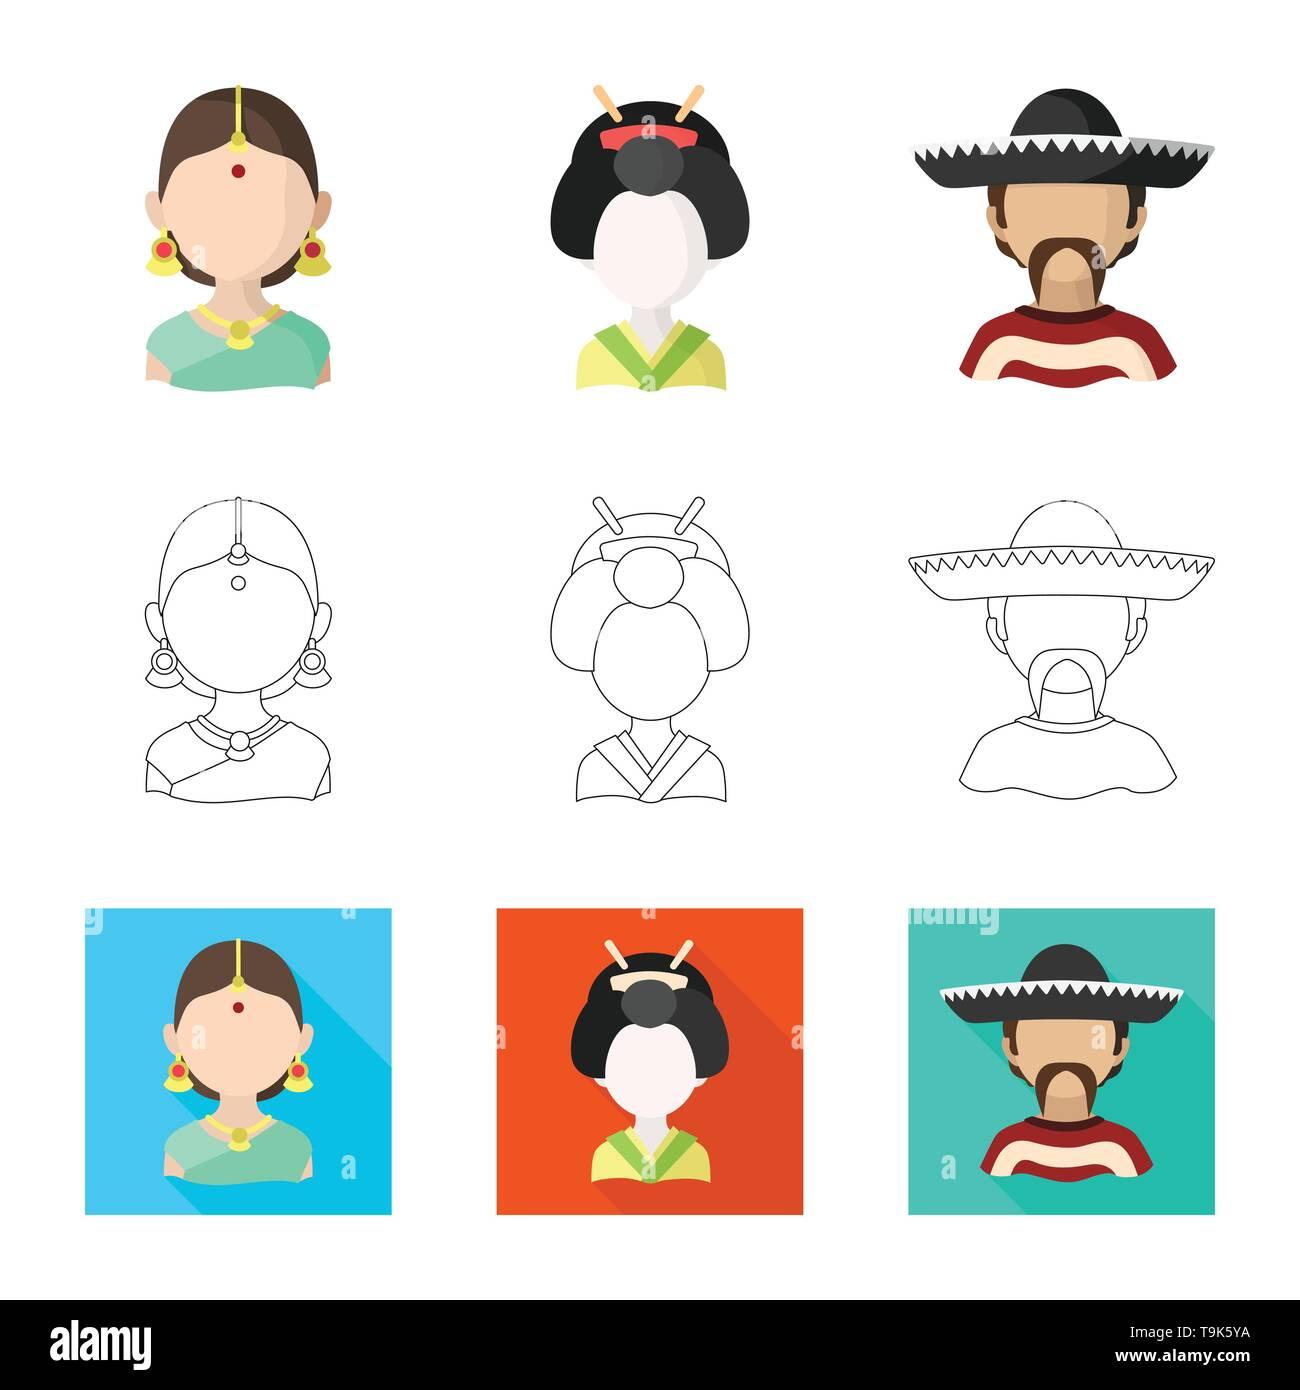 Vector illustration of imitator and resident icon. Collection of imitator and culture stock vector illustration. - Stock Image